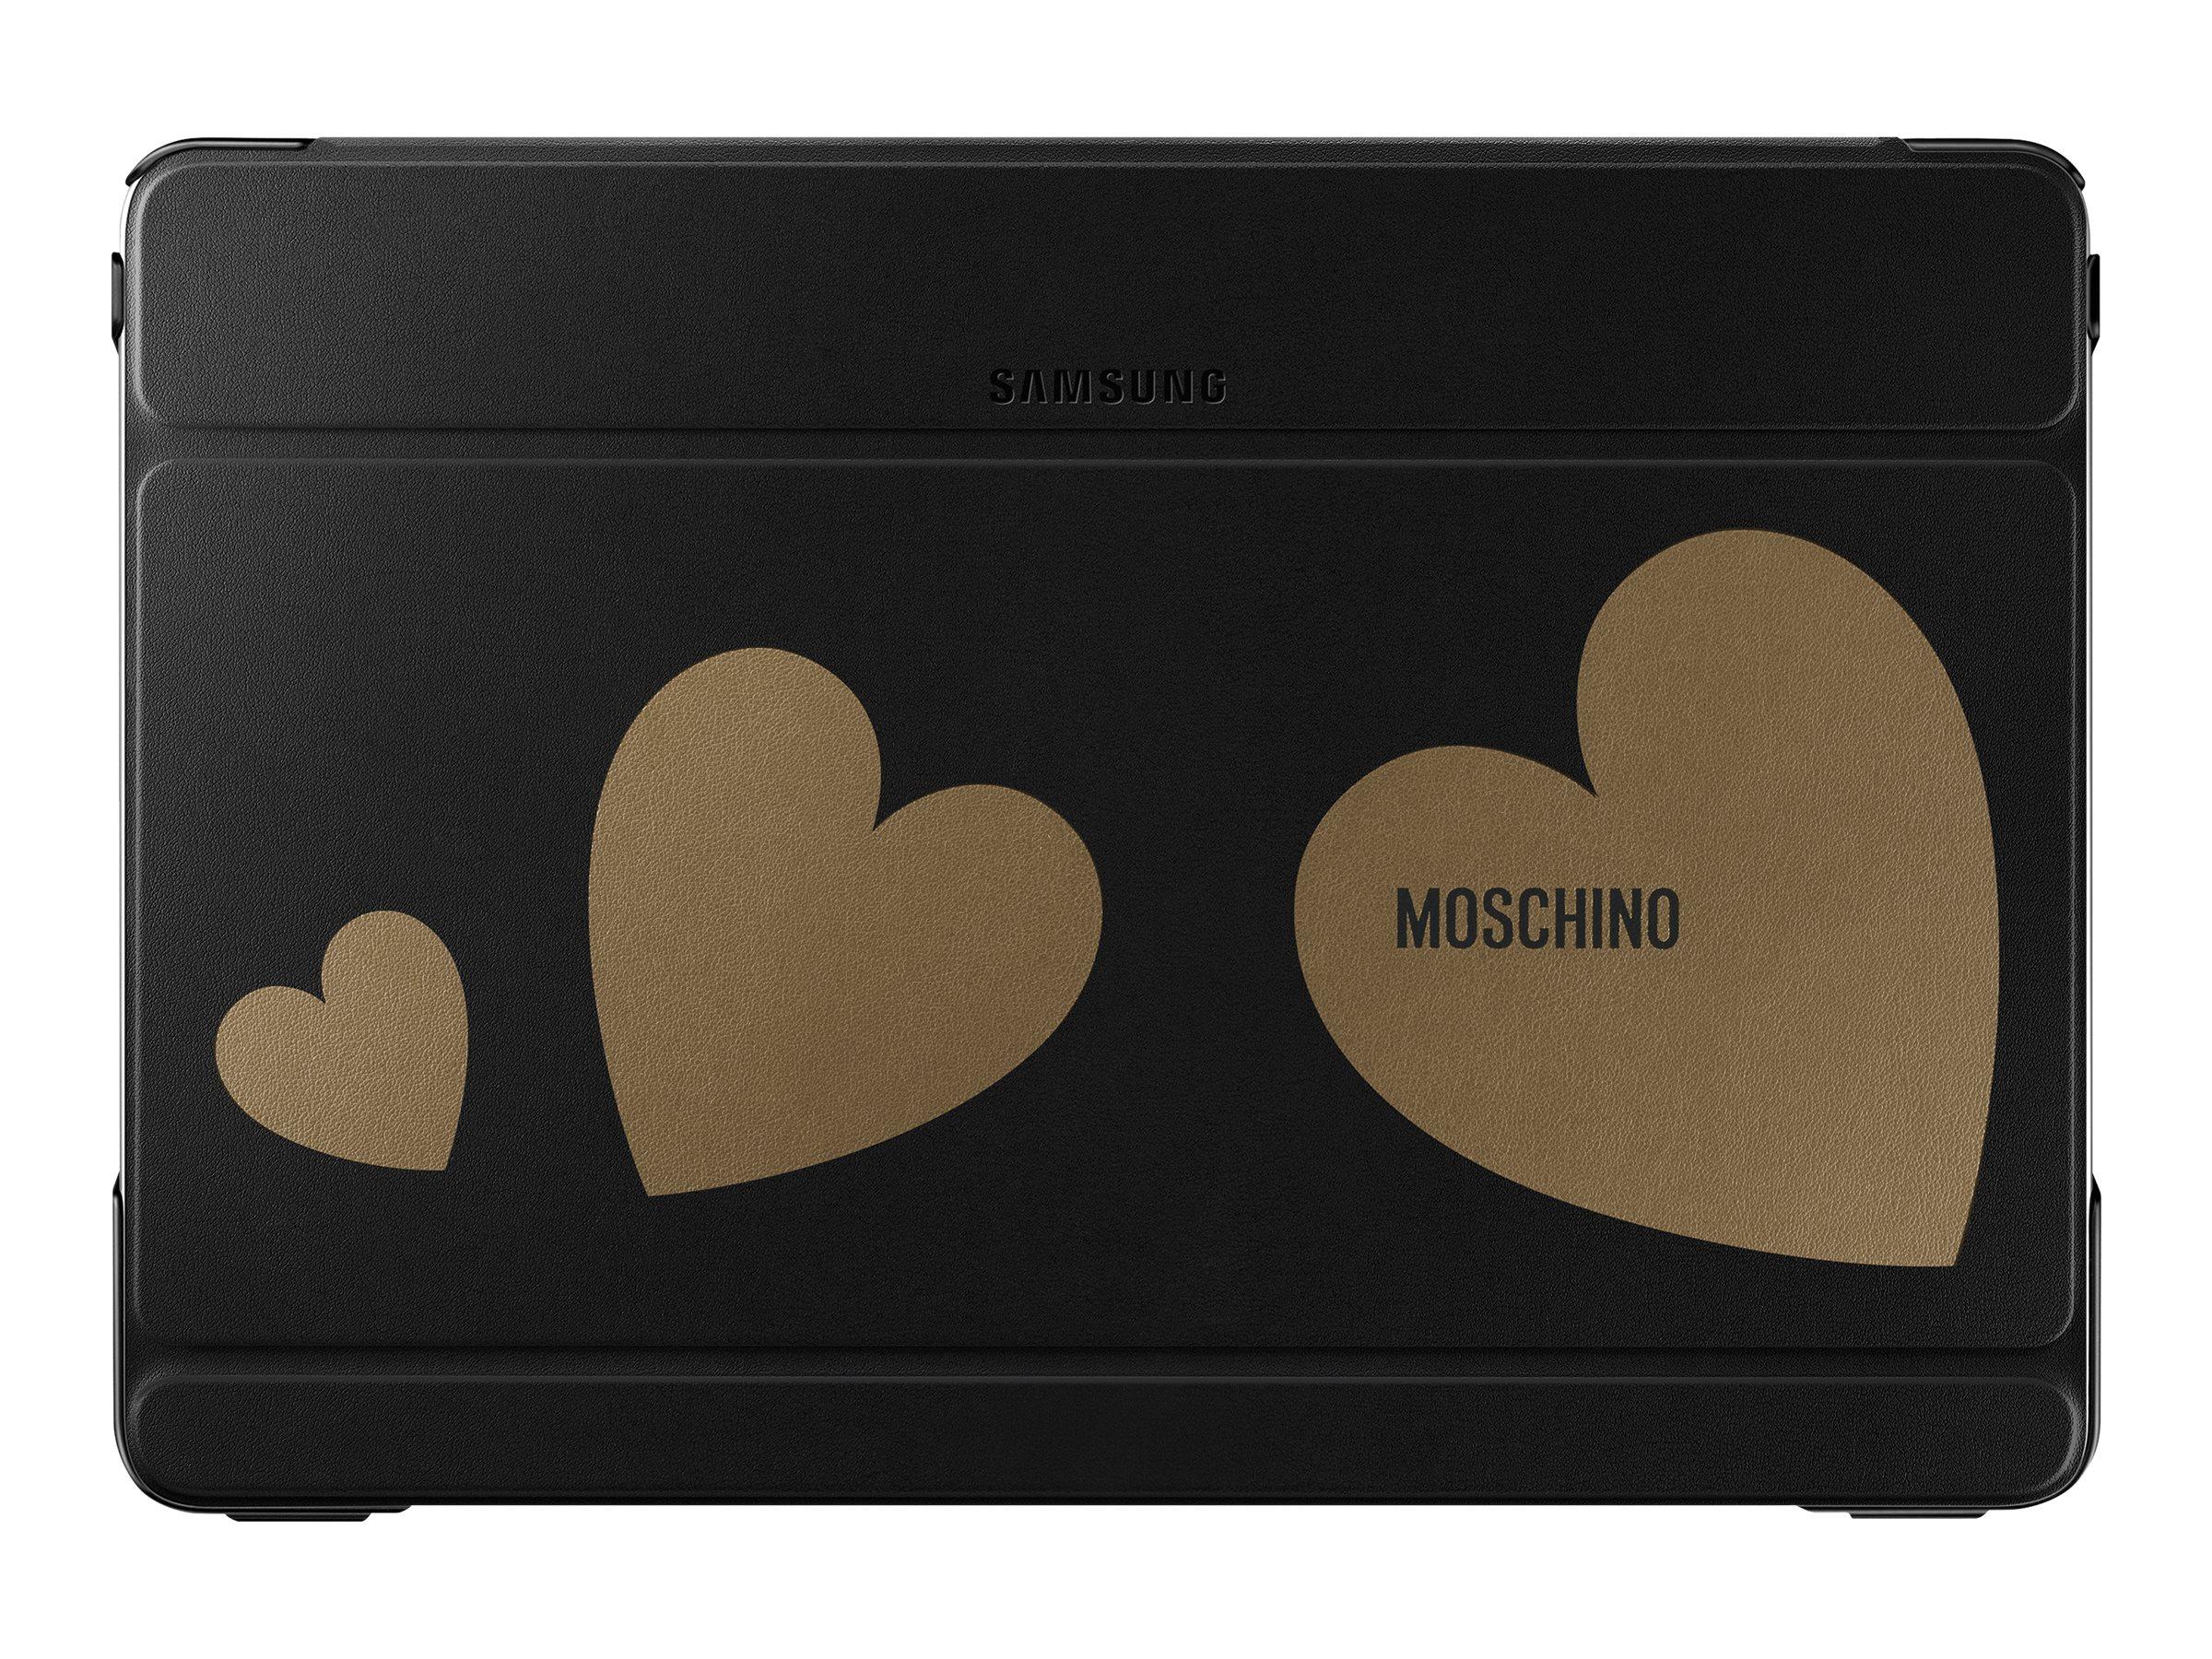 Samsung Book Cover EF-EP900B - Moschino Edition vippedeksel for nettbrett EF-EP900BGEGWW